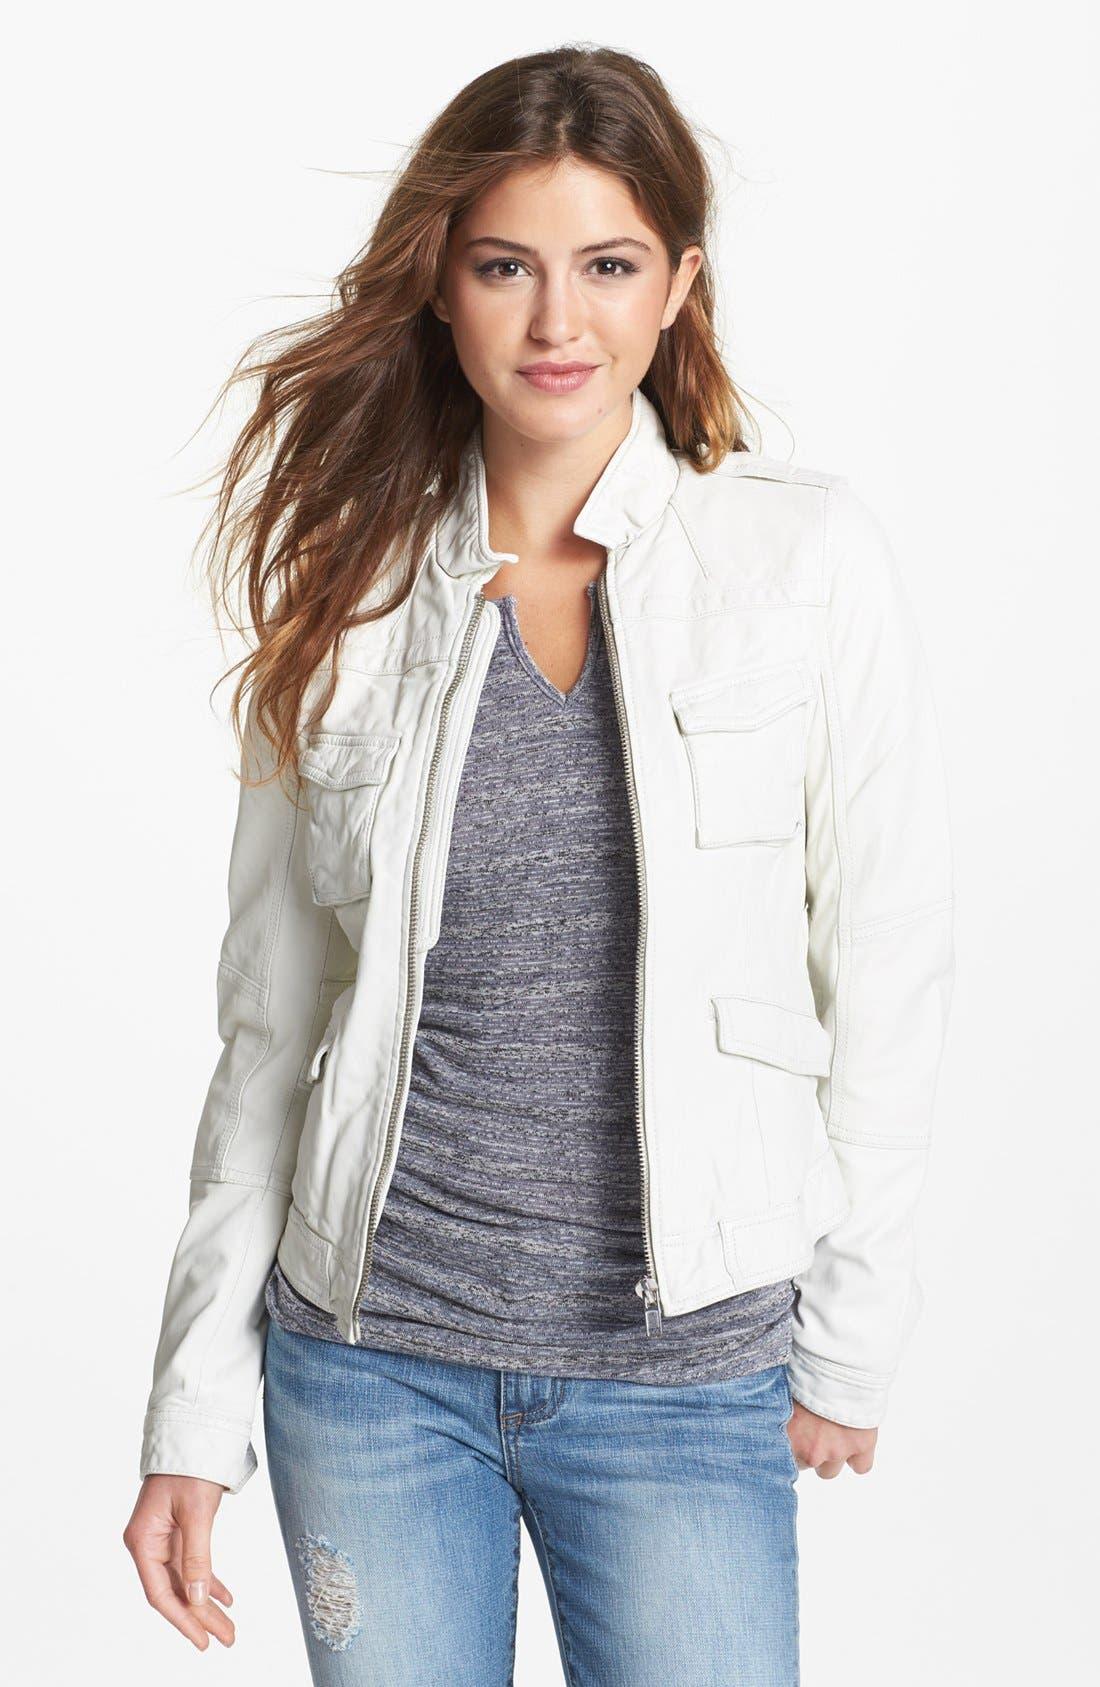 Main Image - Q40 'Military' Leather Jacket